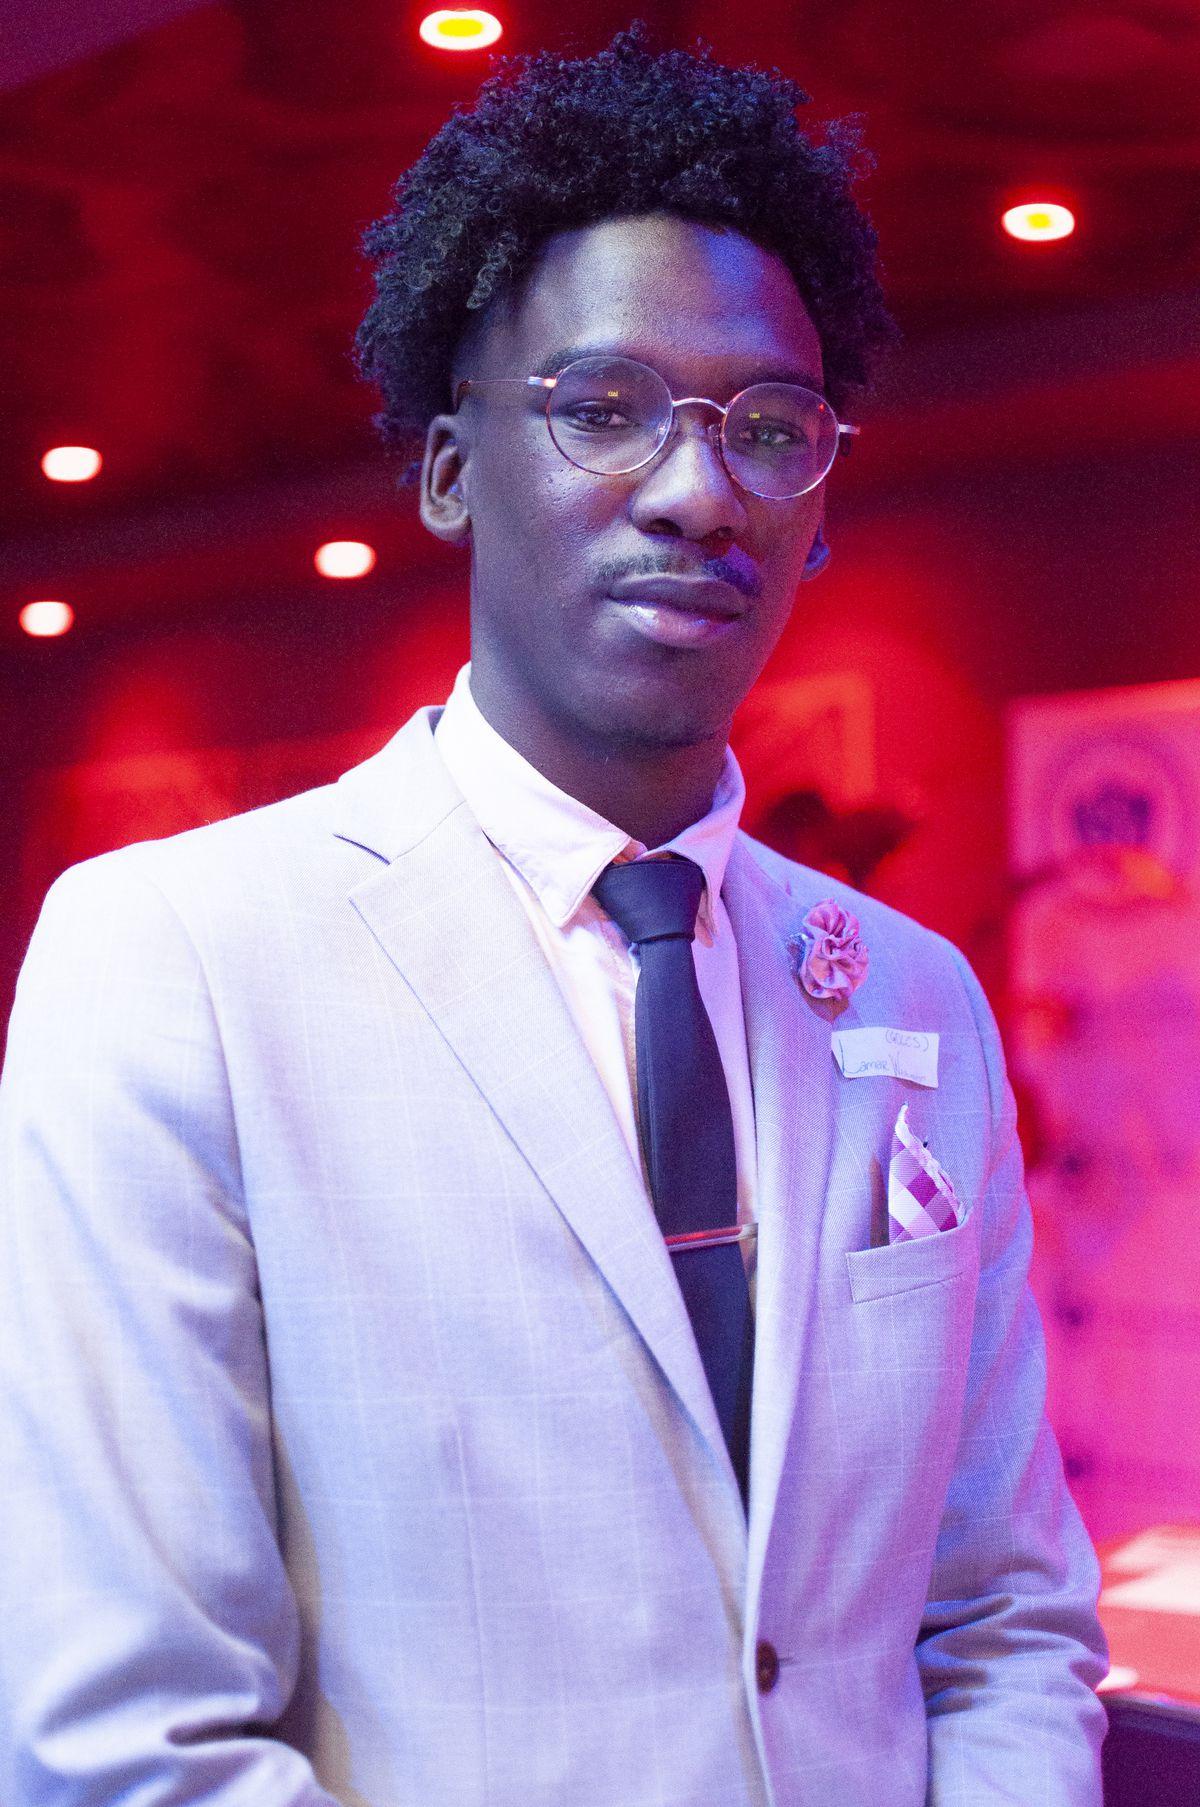 Lamar Washington, event coordinator for Newark's Great Oaks Legacy Charter Schools.